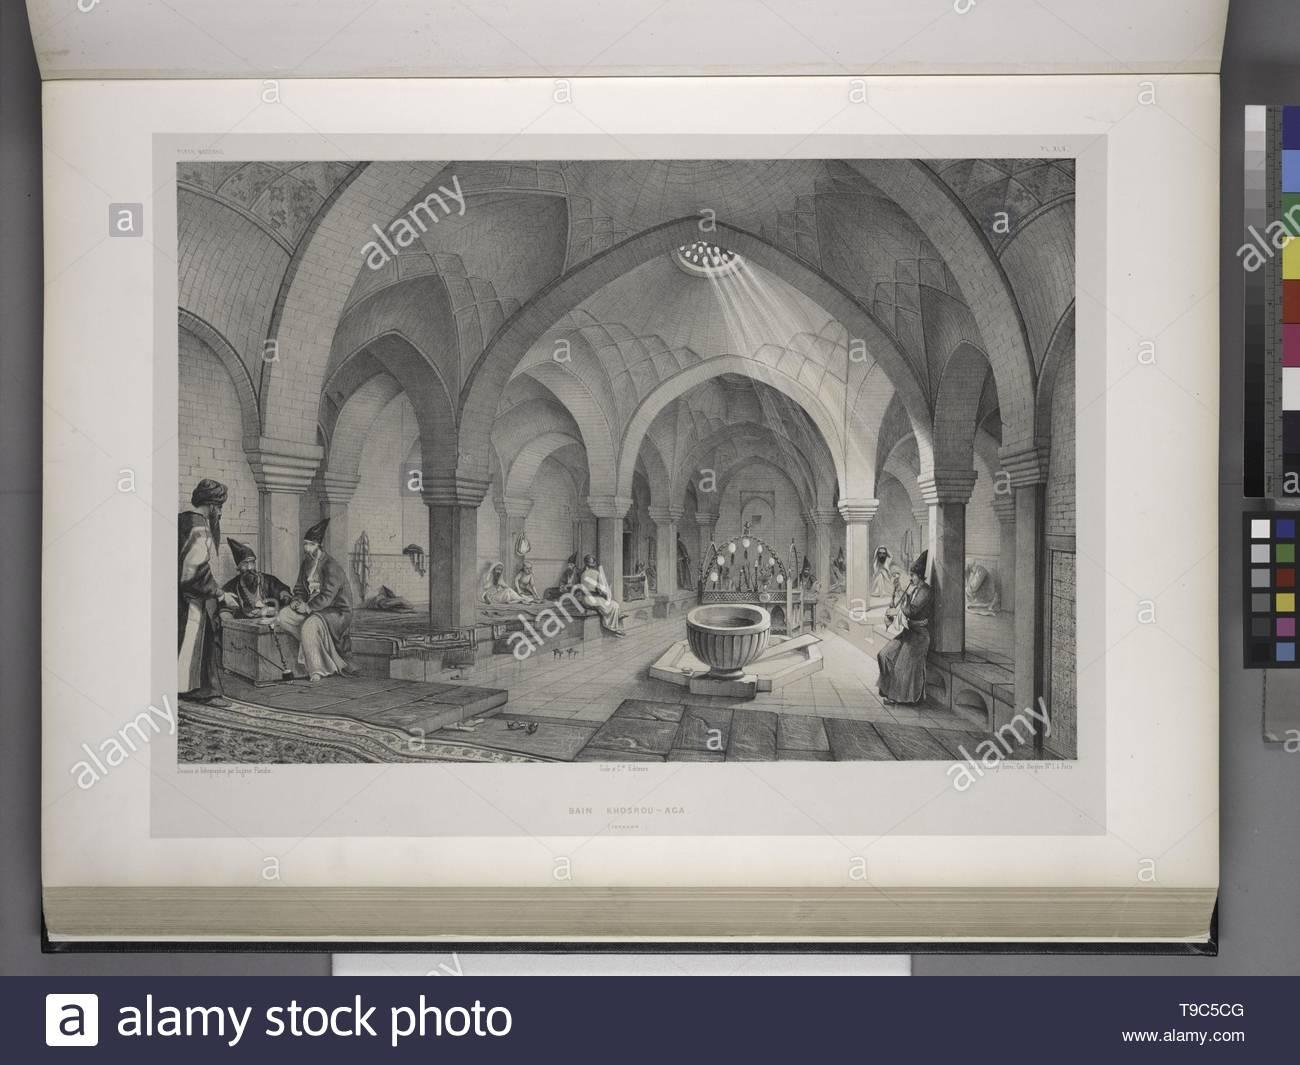 Flandin, Eugène (1809-1876) - Bain Khosrou-Aga [Intérieur], Ispahan Stockbild